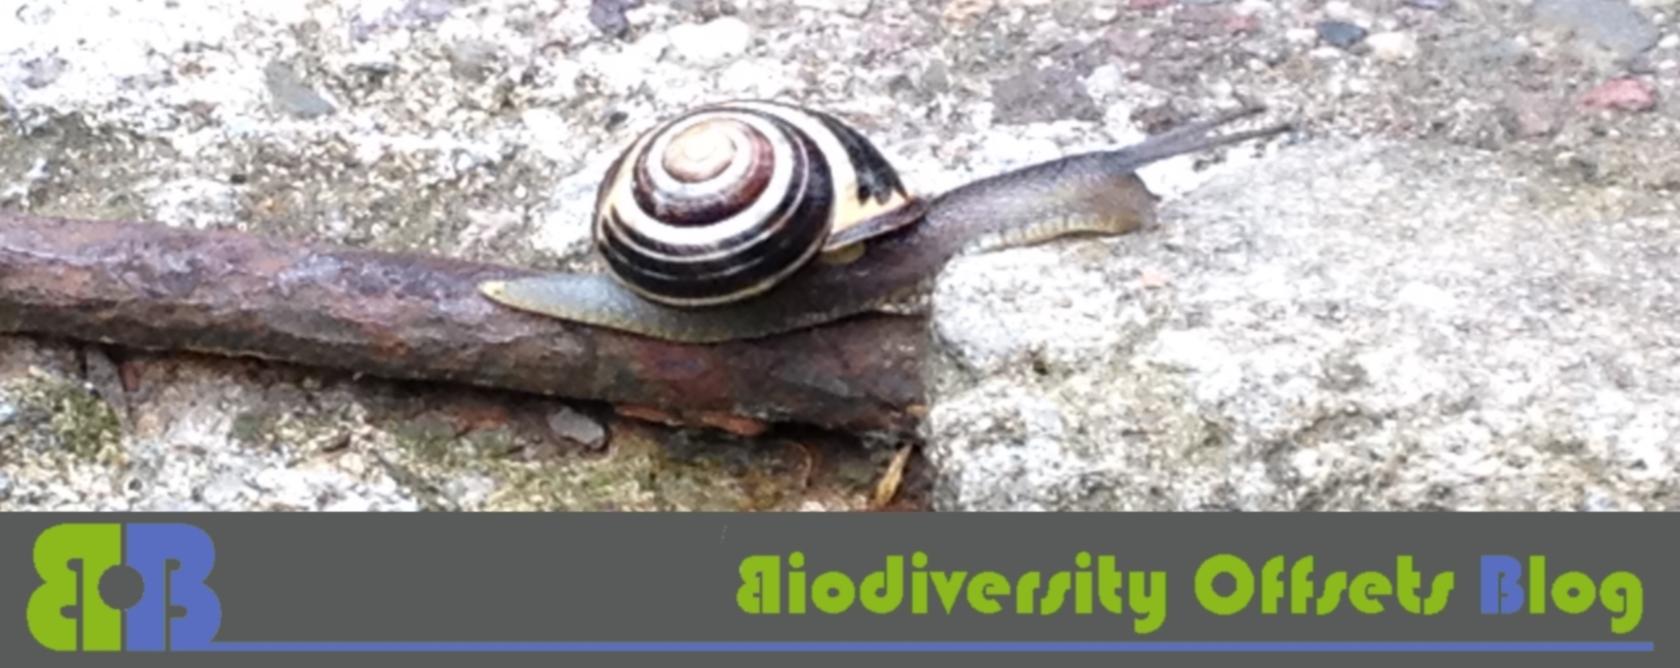 Biodiversity Offsets Blog Logo_hellgruen_schnecke_1680